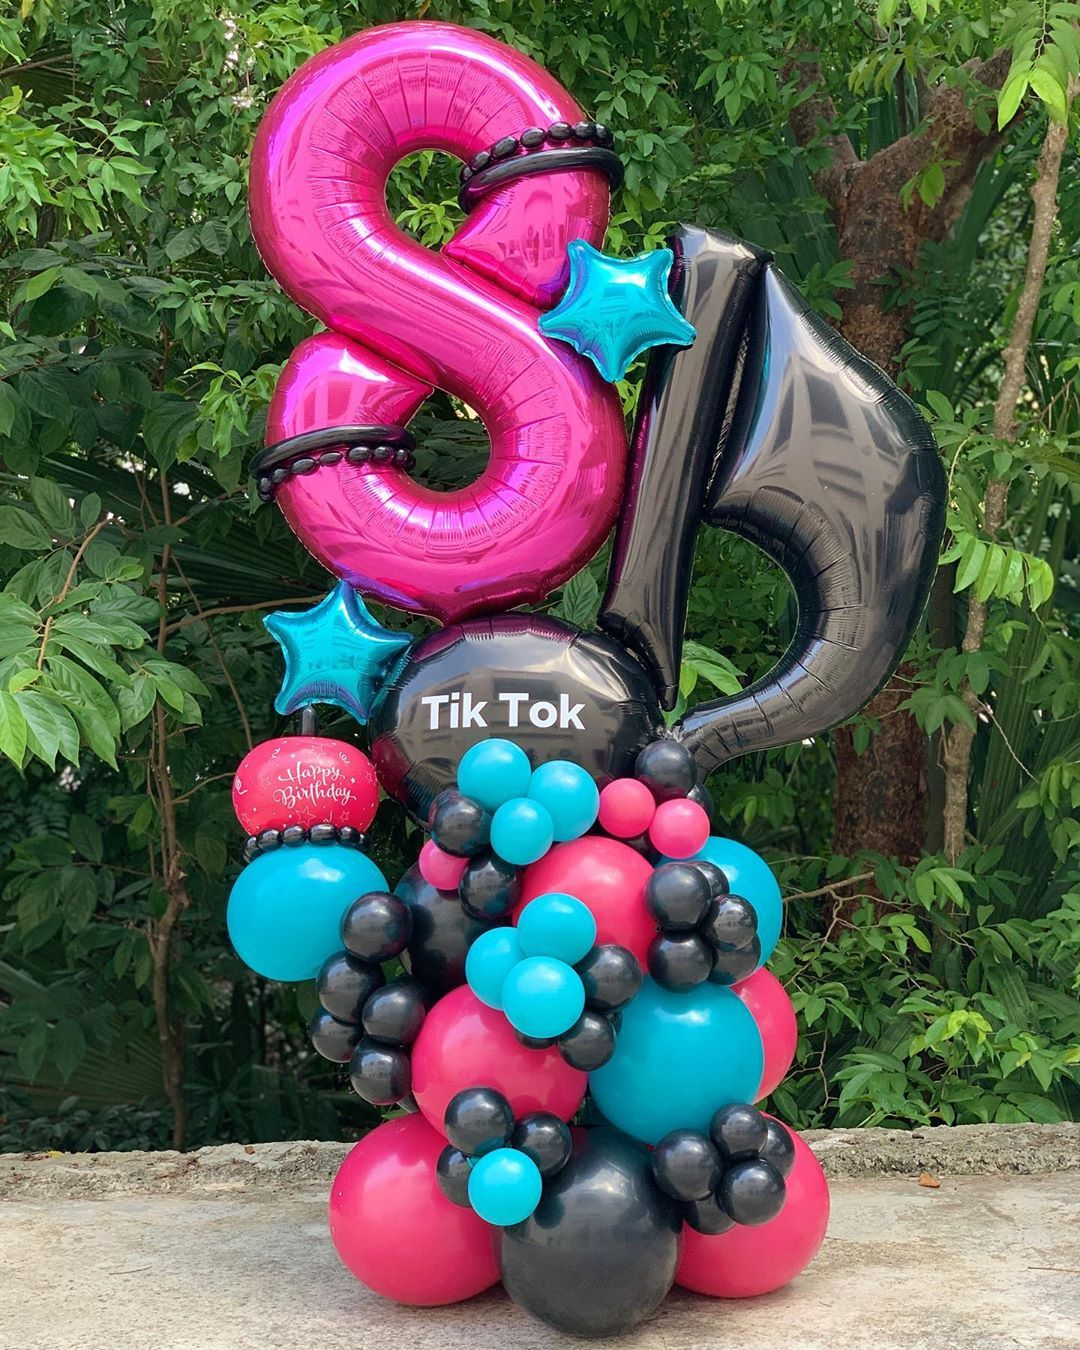 Globos Fiesta Tik Tok Birthday Balloon Decorations Birthday Balloons Party Balloons